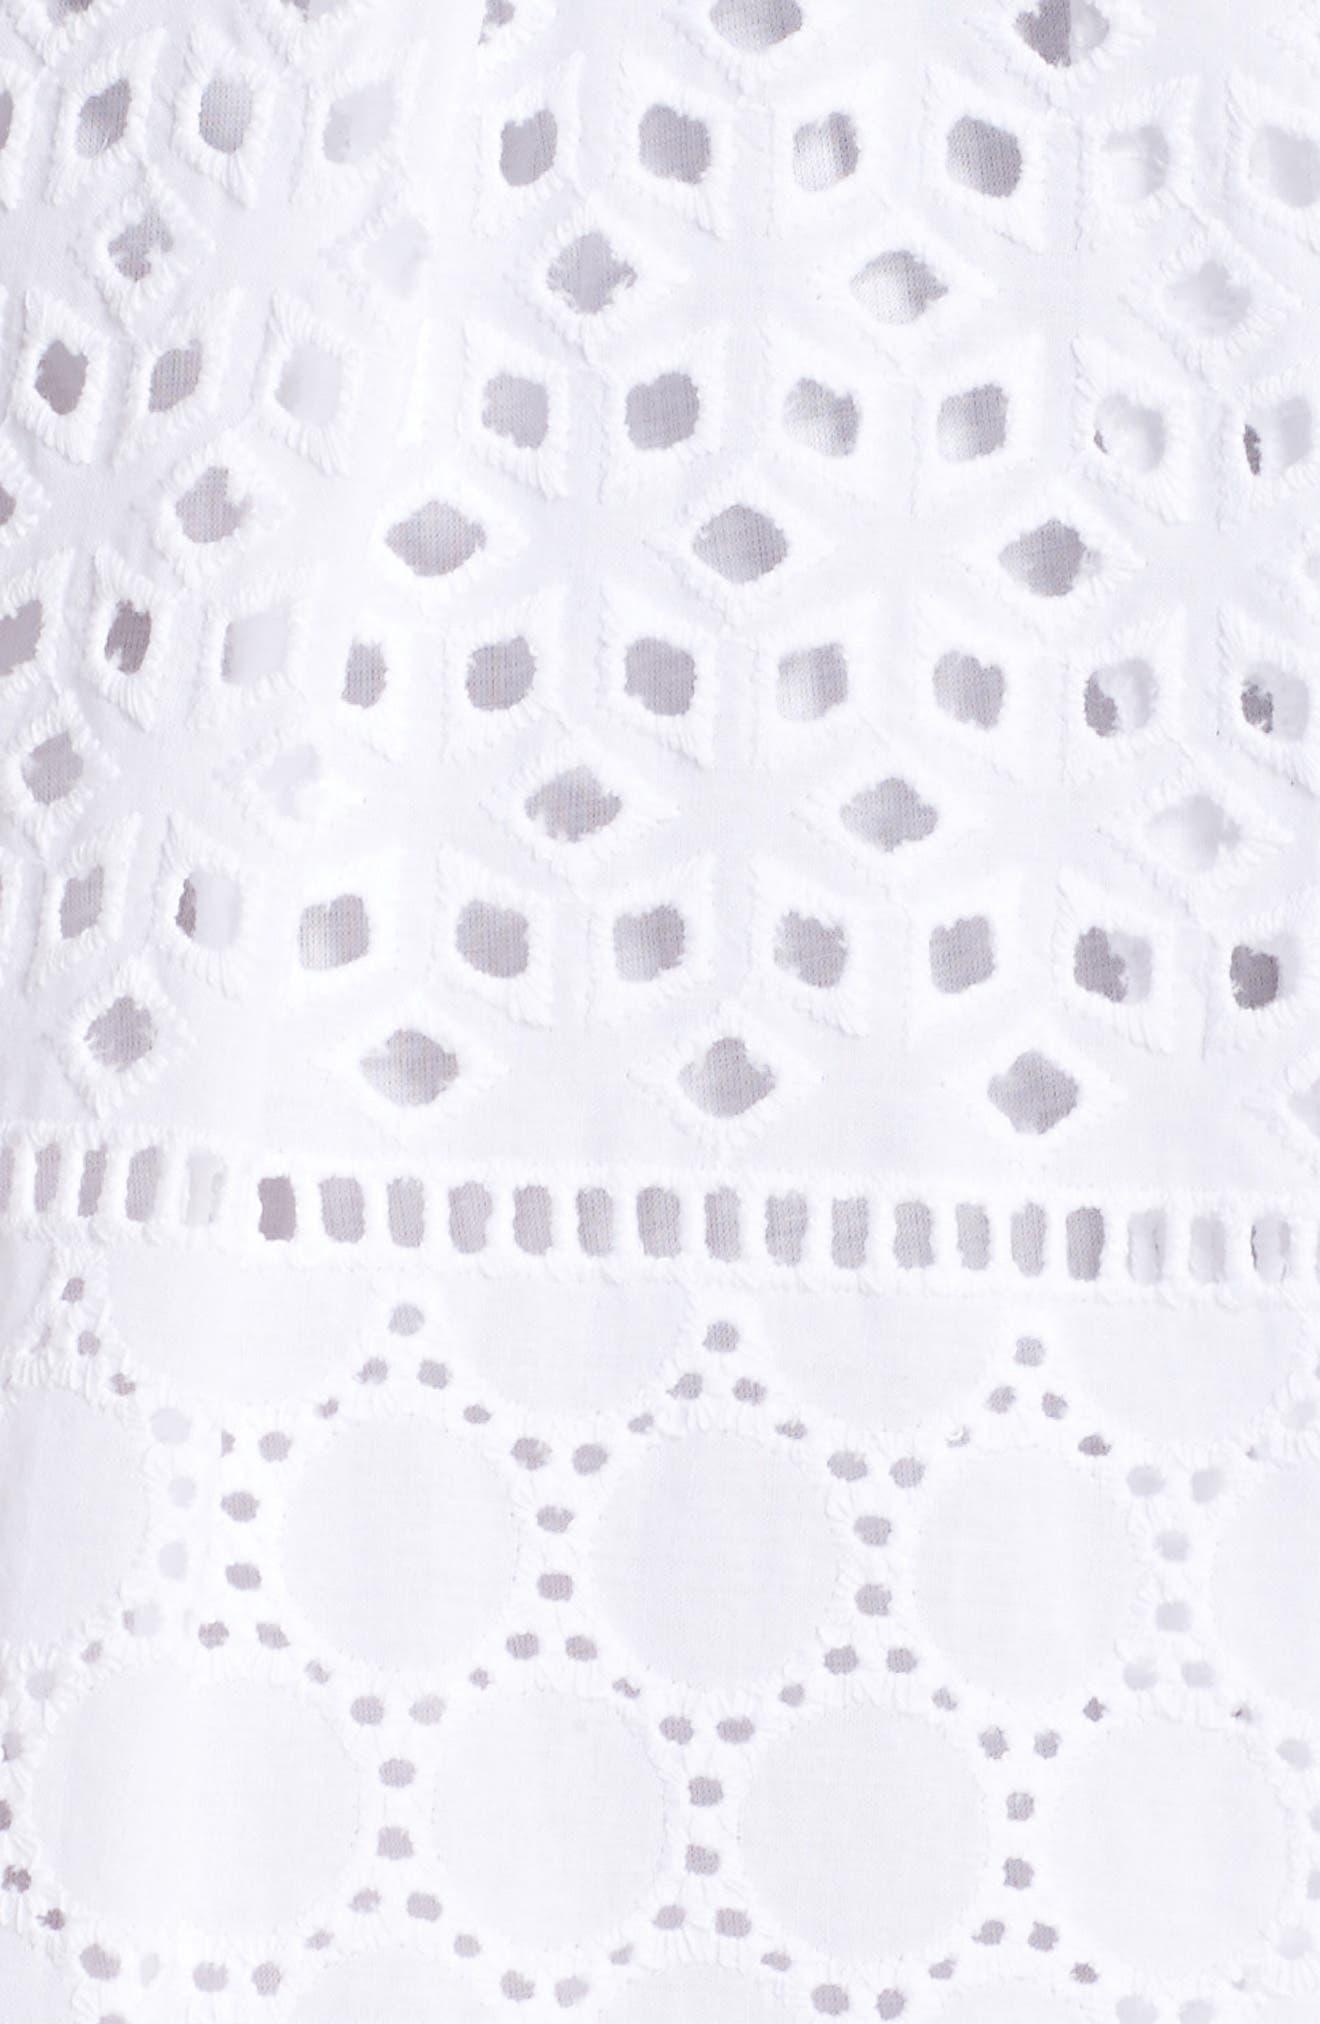 V-Neck Cotton Eyelet Fit & Flare Dress,                             Alternate thumbnail 11, color,